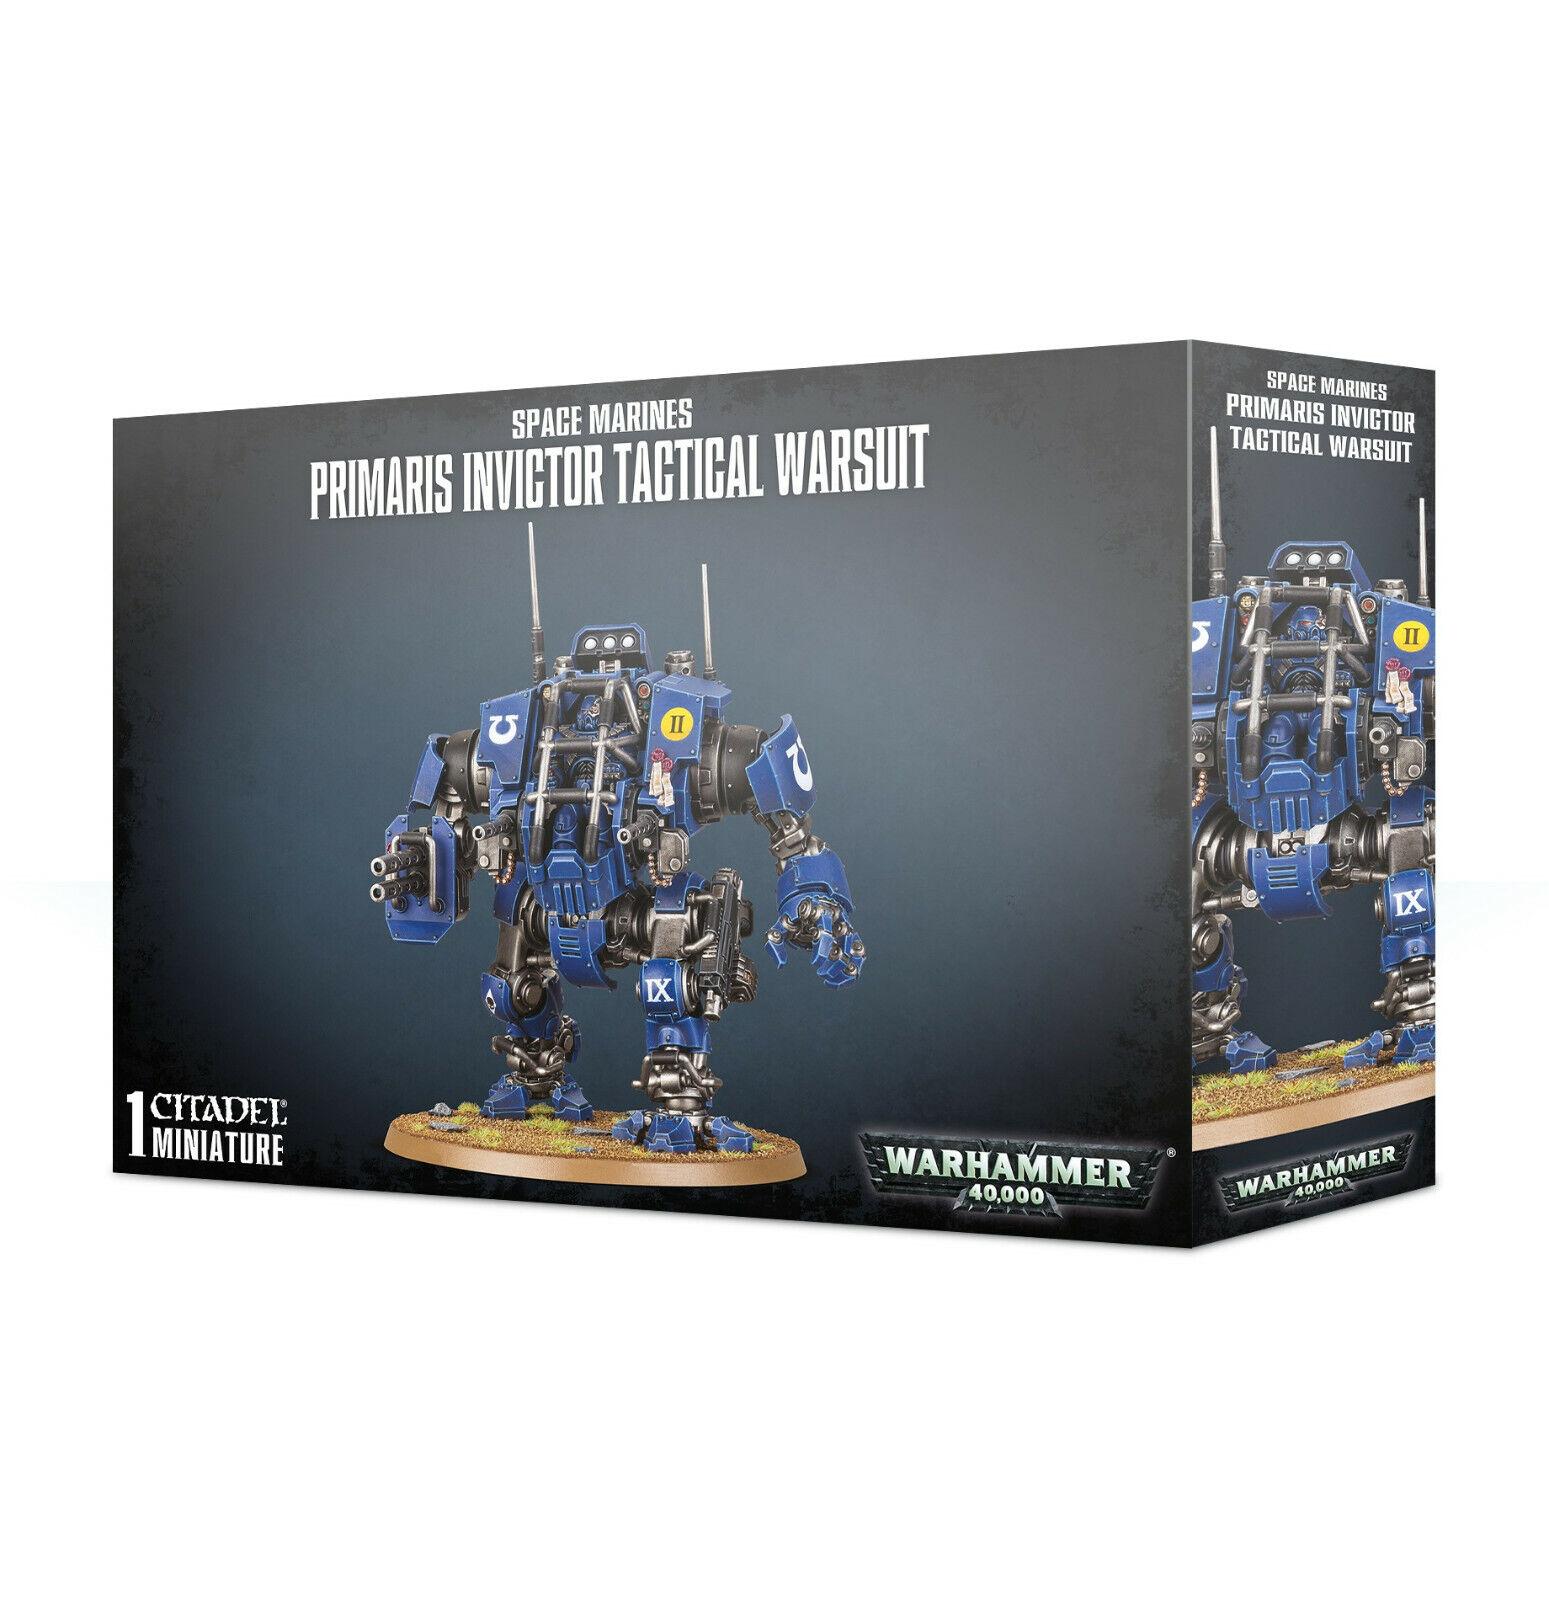 Primaris Invictor Tactical Warsuit Space Marine Warhammer 40K